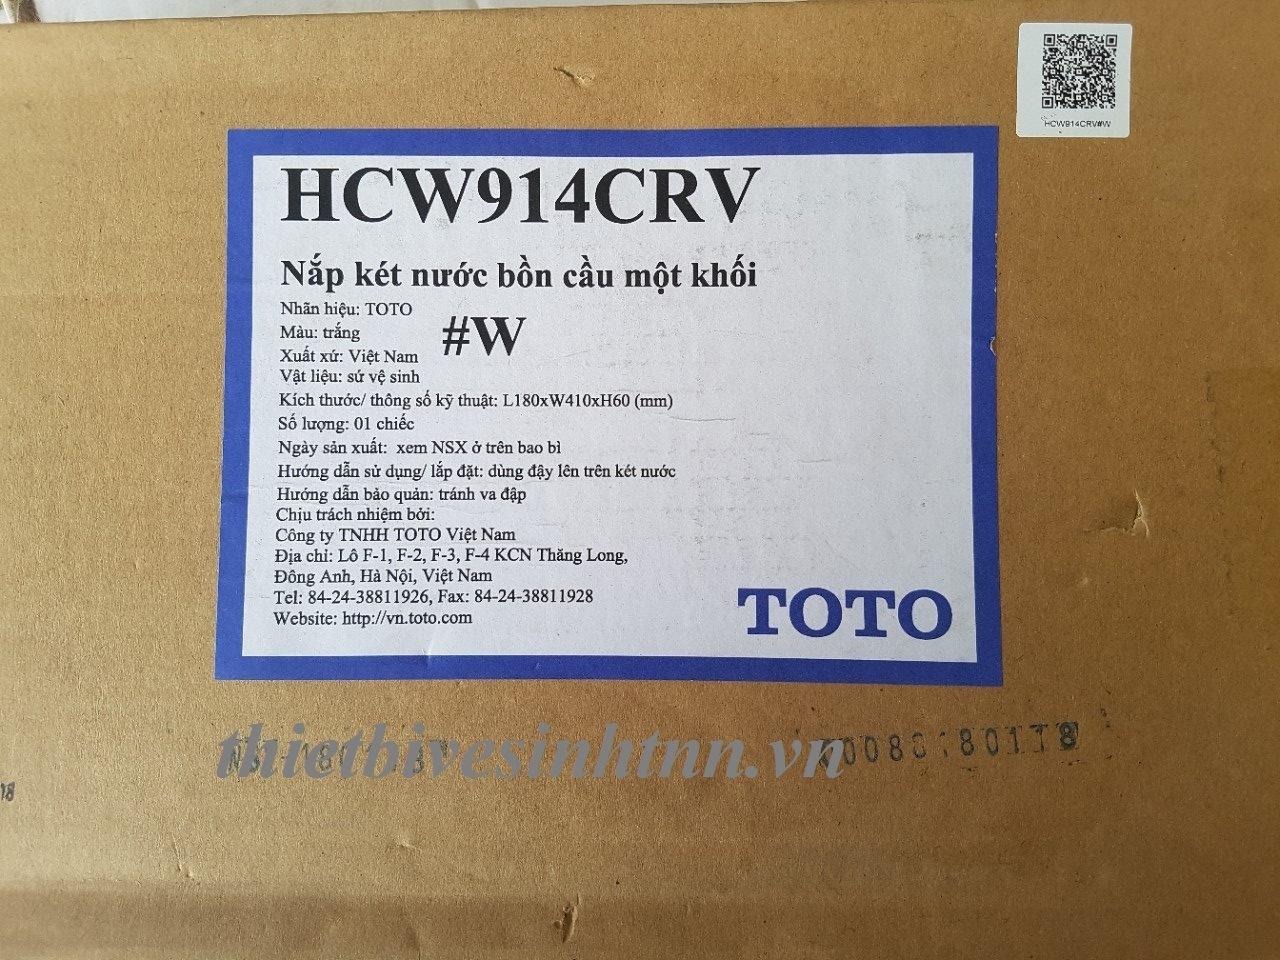 nap-ket-nuoc-toto-HCW914CRV